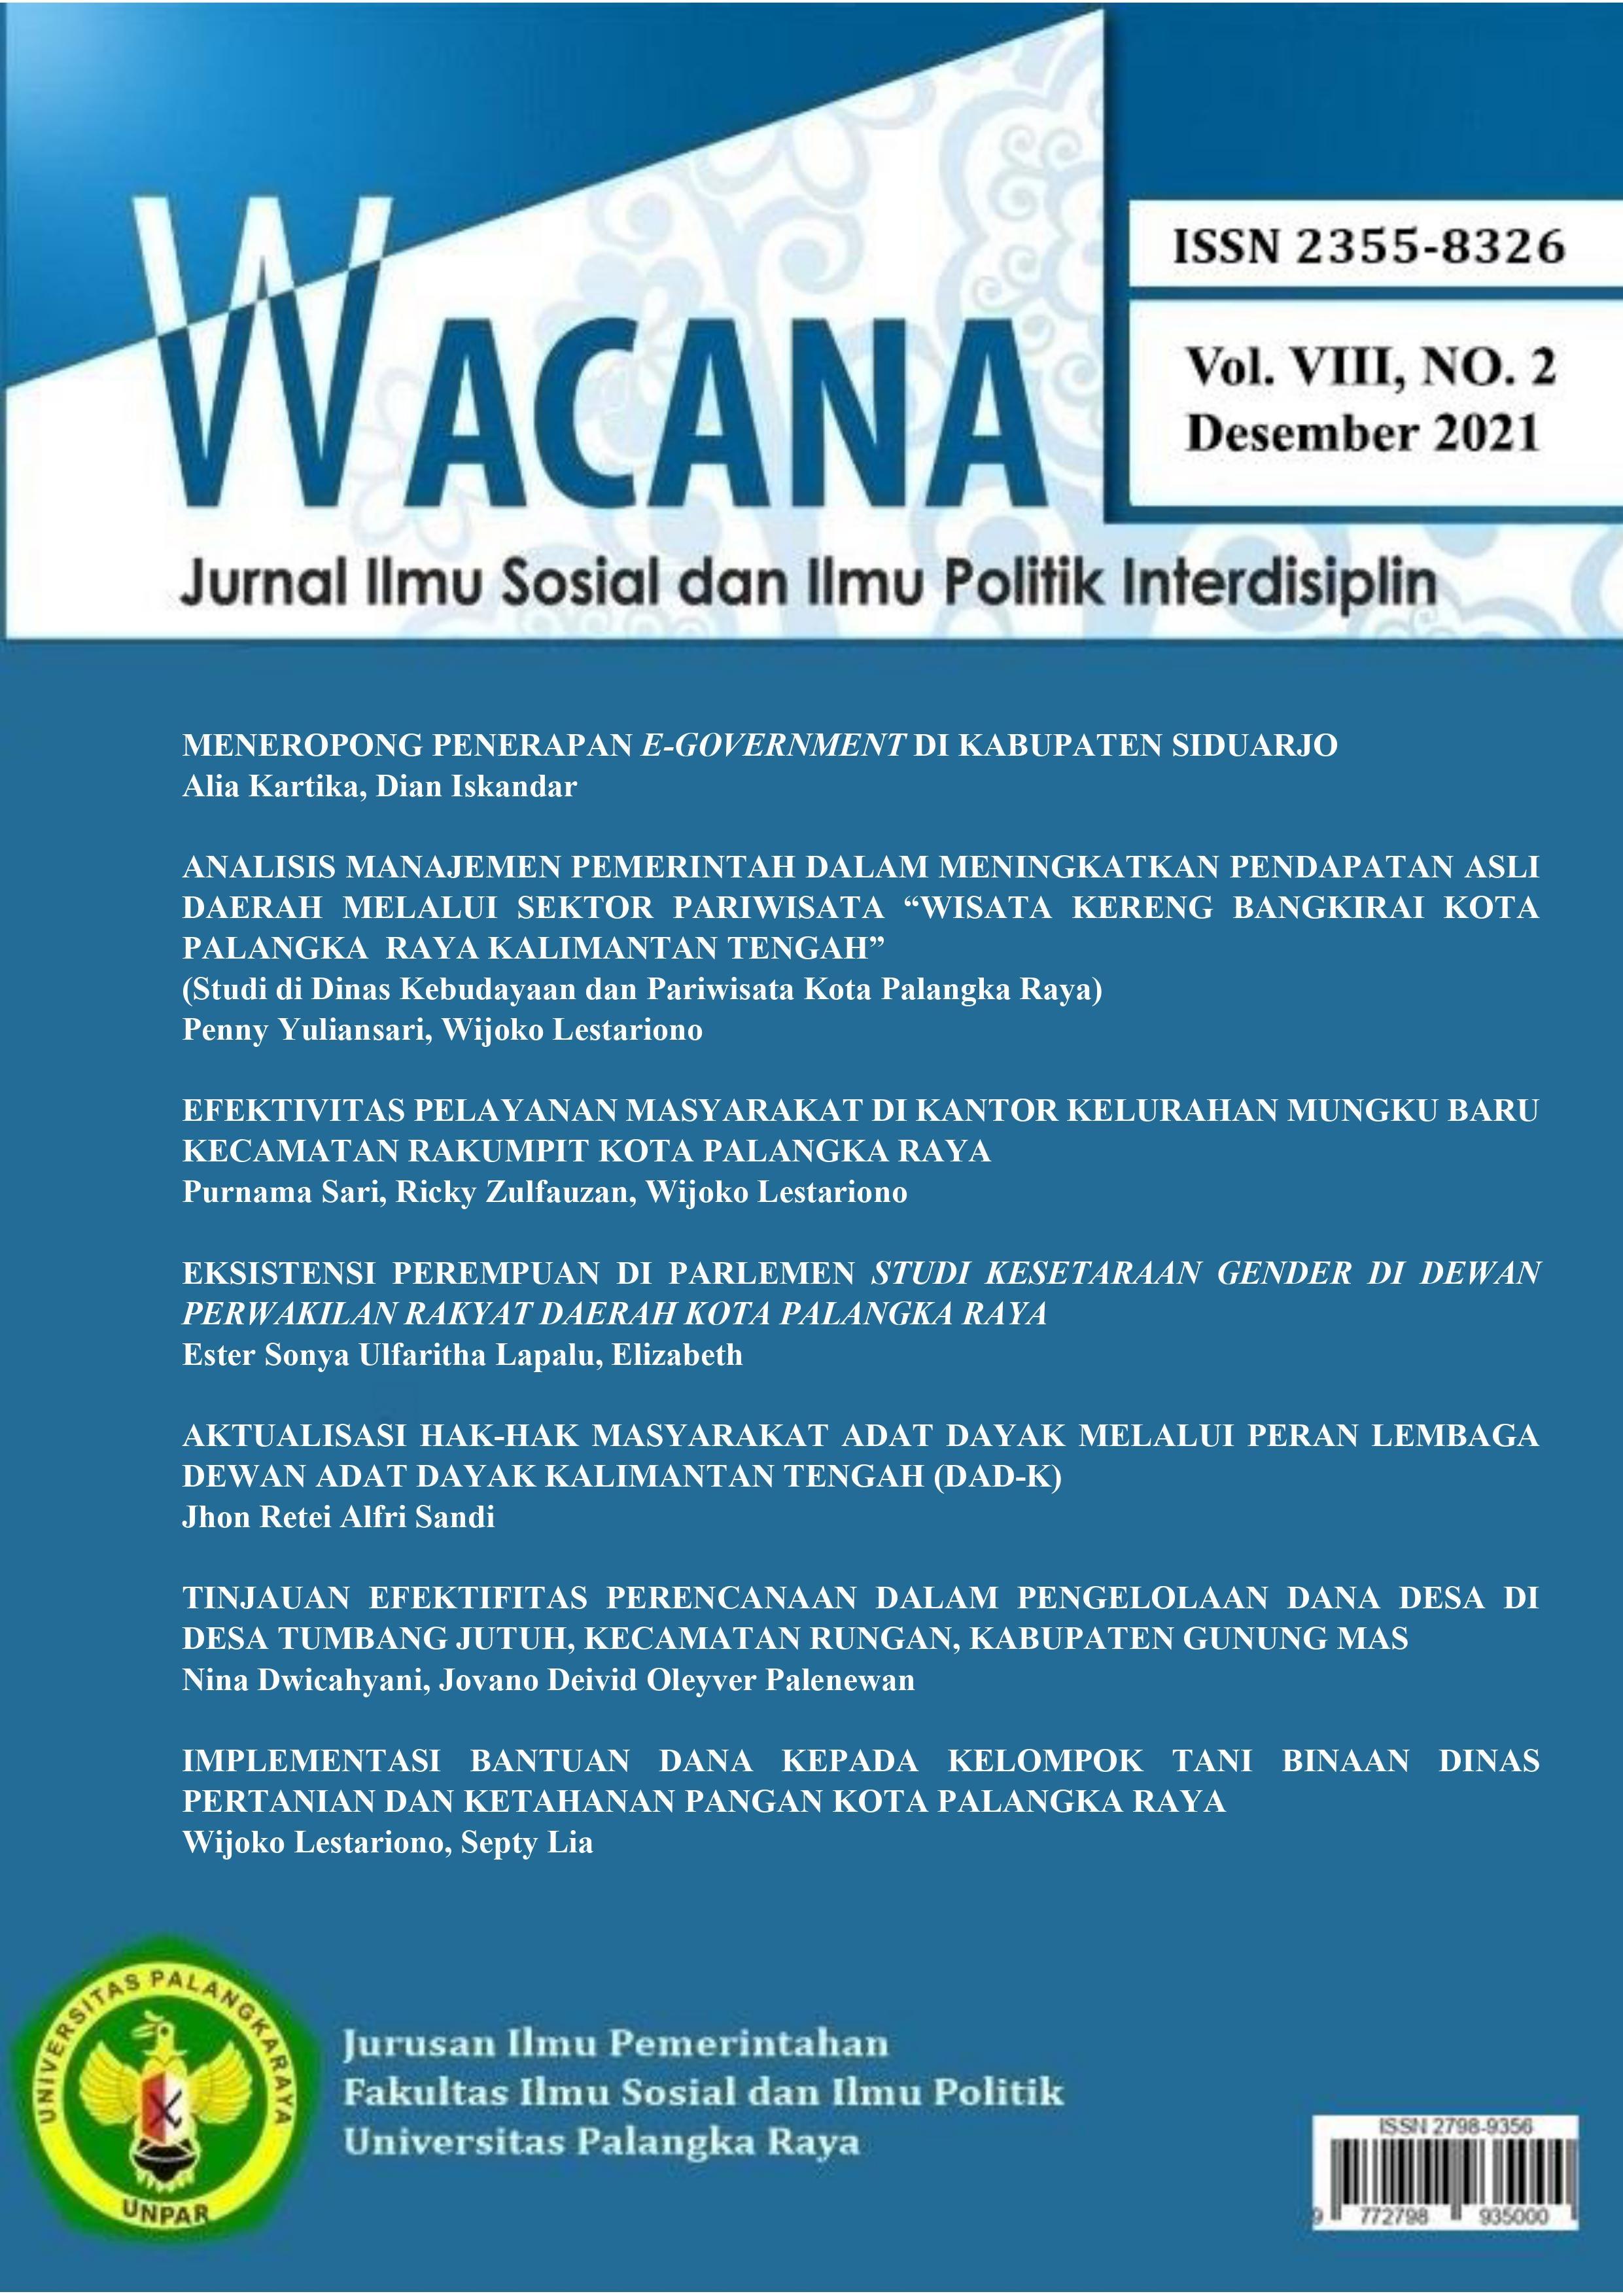 View Vol. 8 No. 1 (2021): Wacana: Jurnal Ilmu Sosial dan Ilmu Politik Interdisiplin